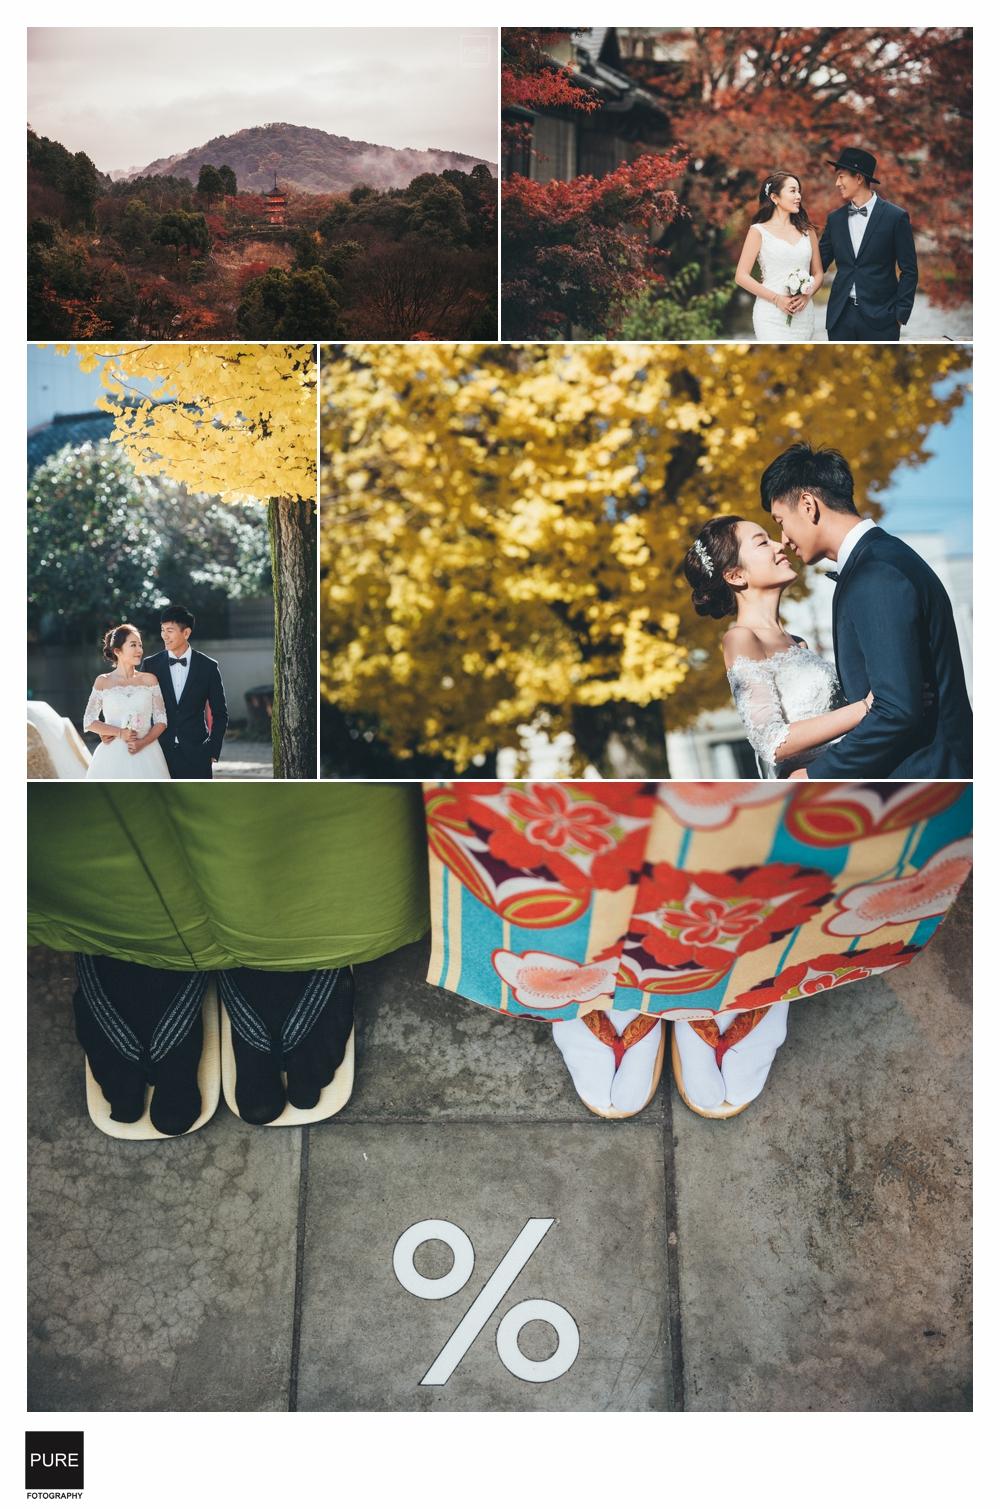 PUREFOTO_海外婚禮平面攝影Oversea_wedding_京都海外婚紗準備篇